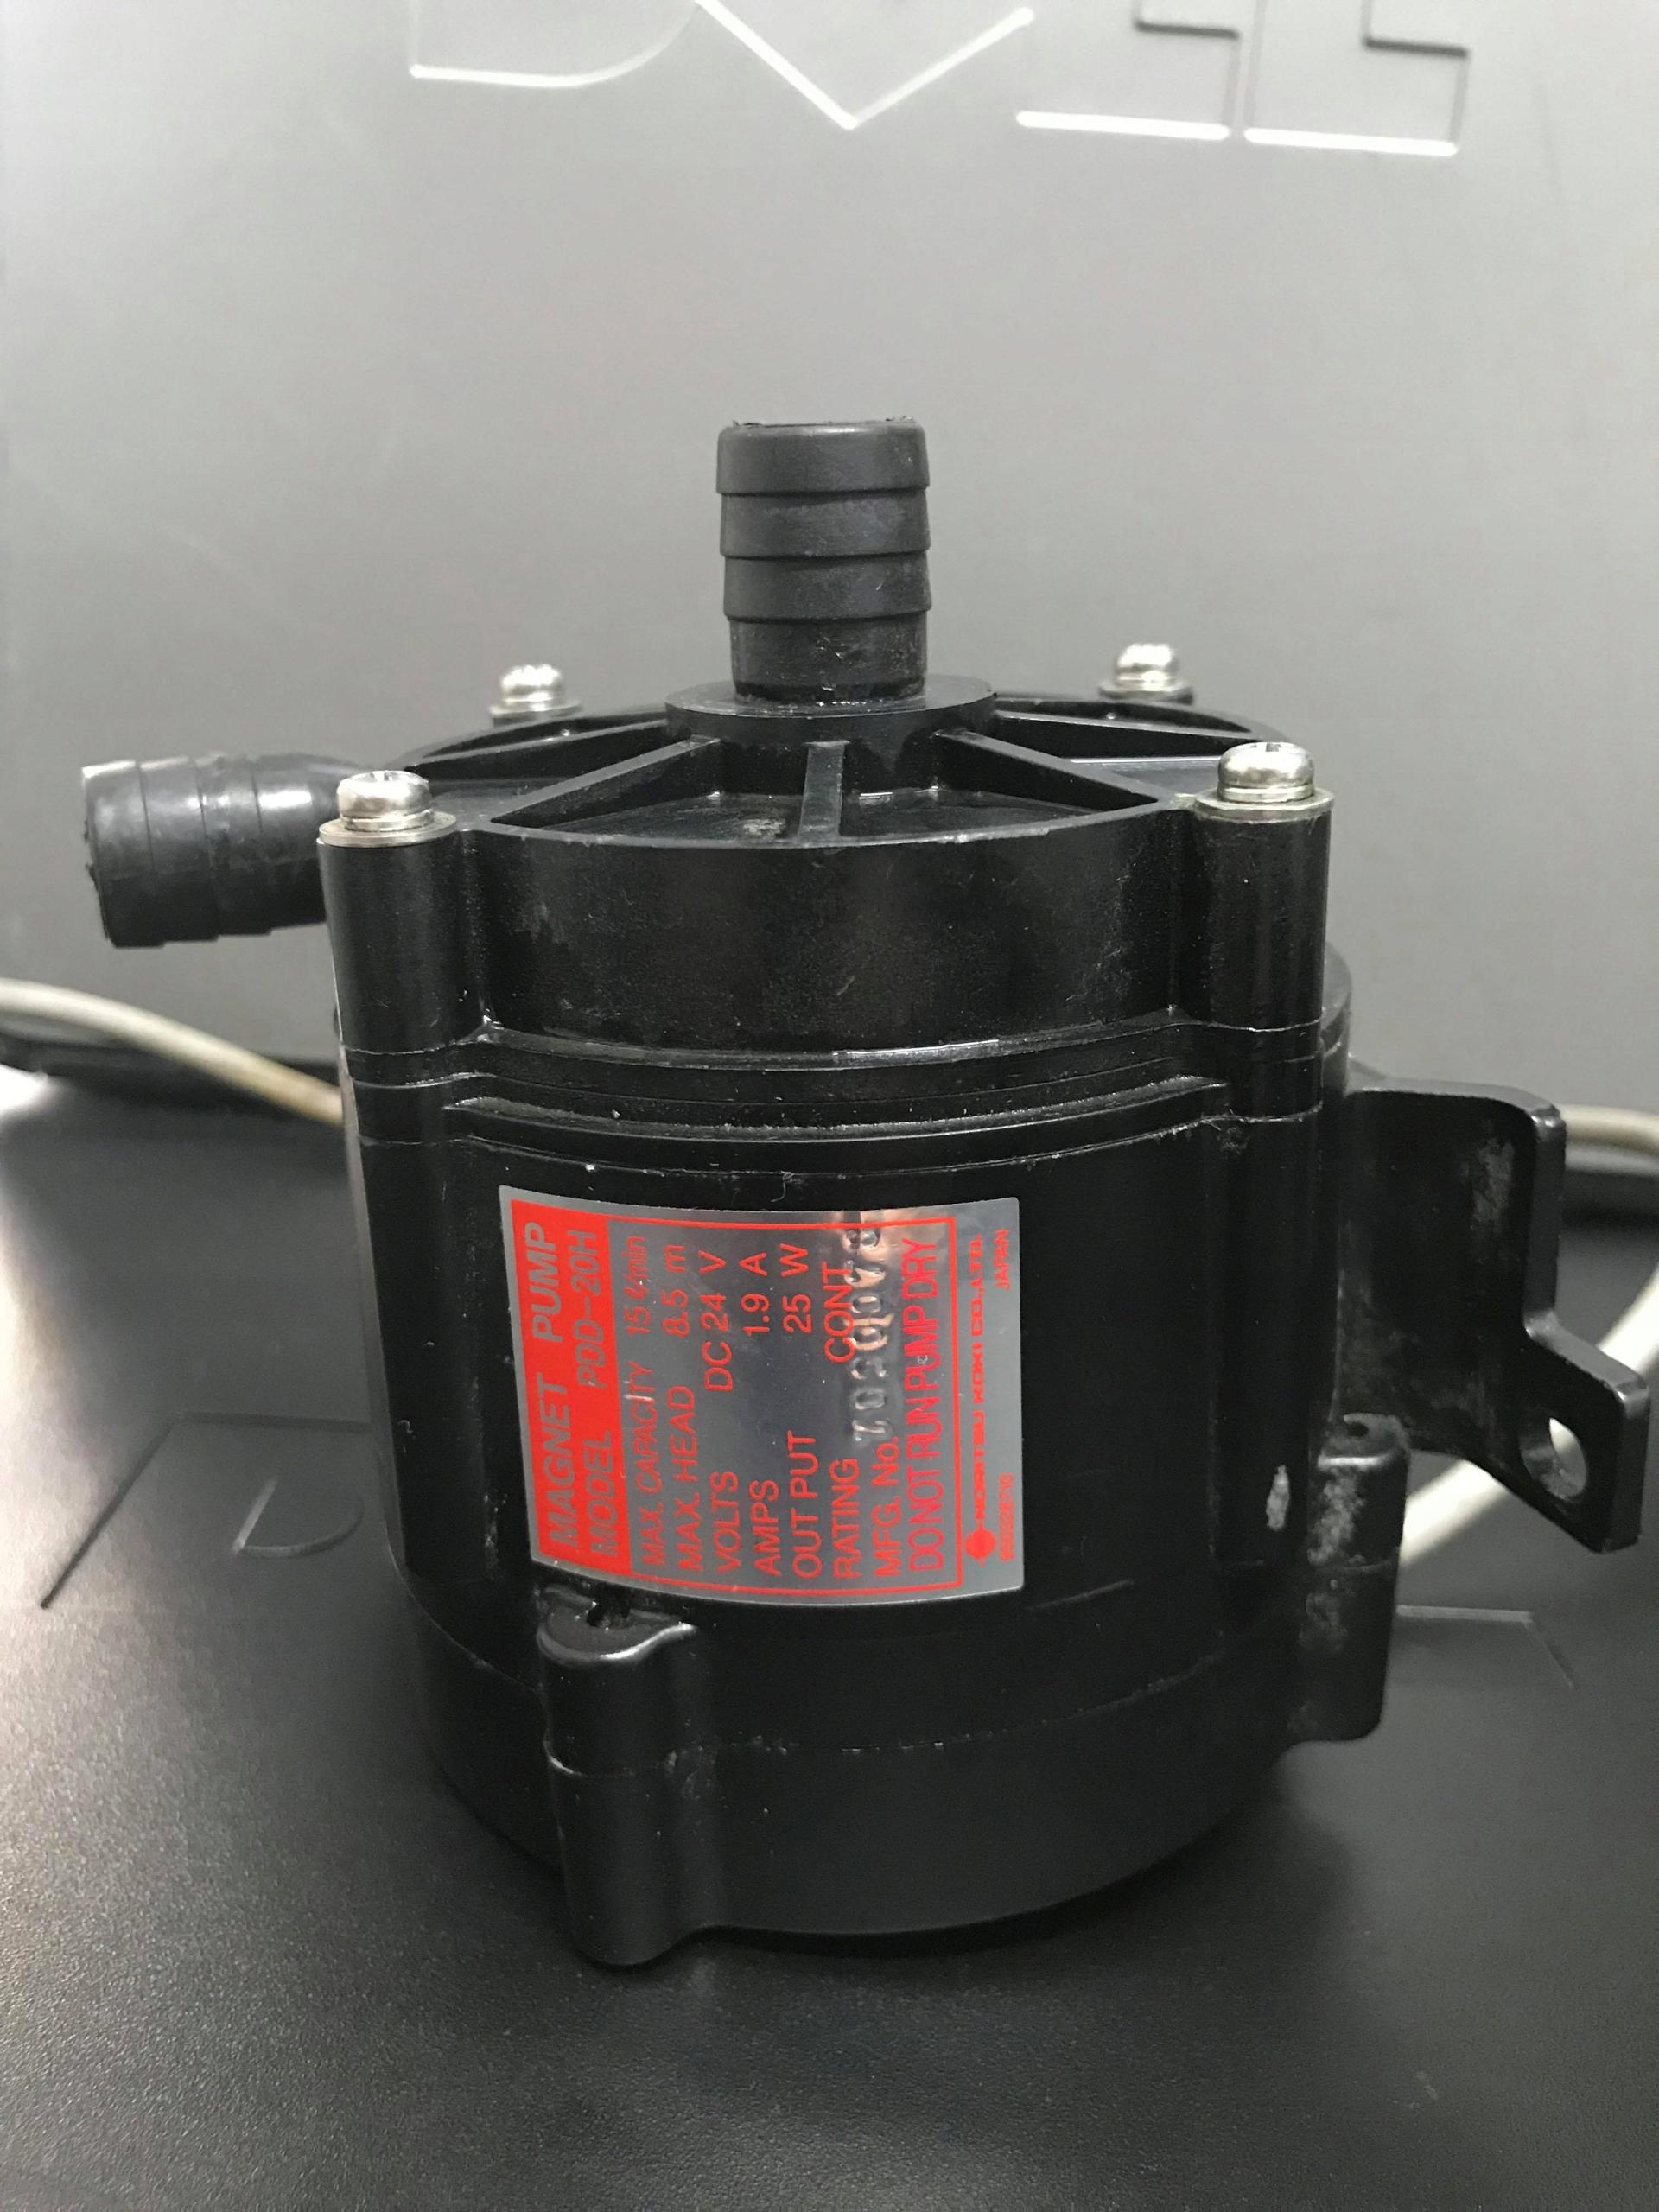 Pompa cyrkulacyjna IWAKI PDD-20H 24V 25W 15l/min